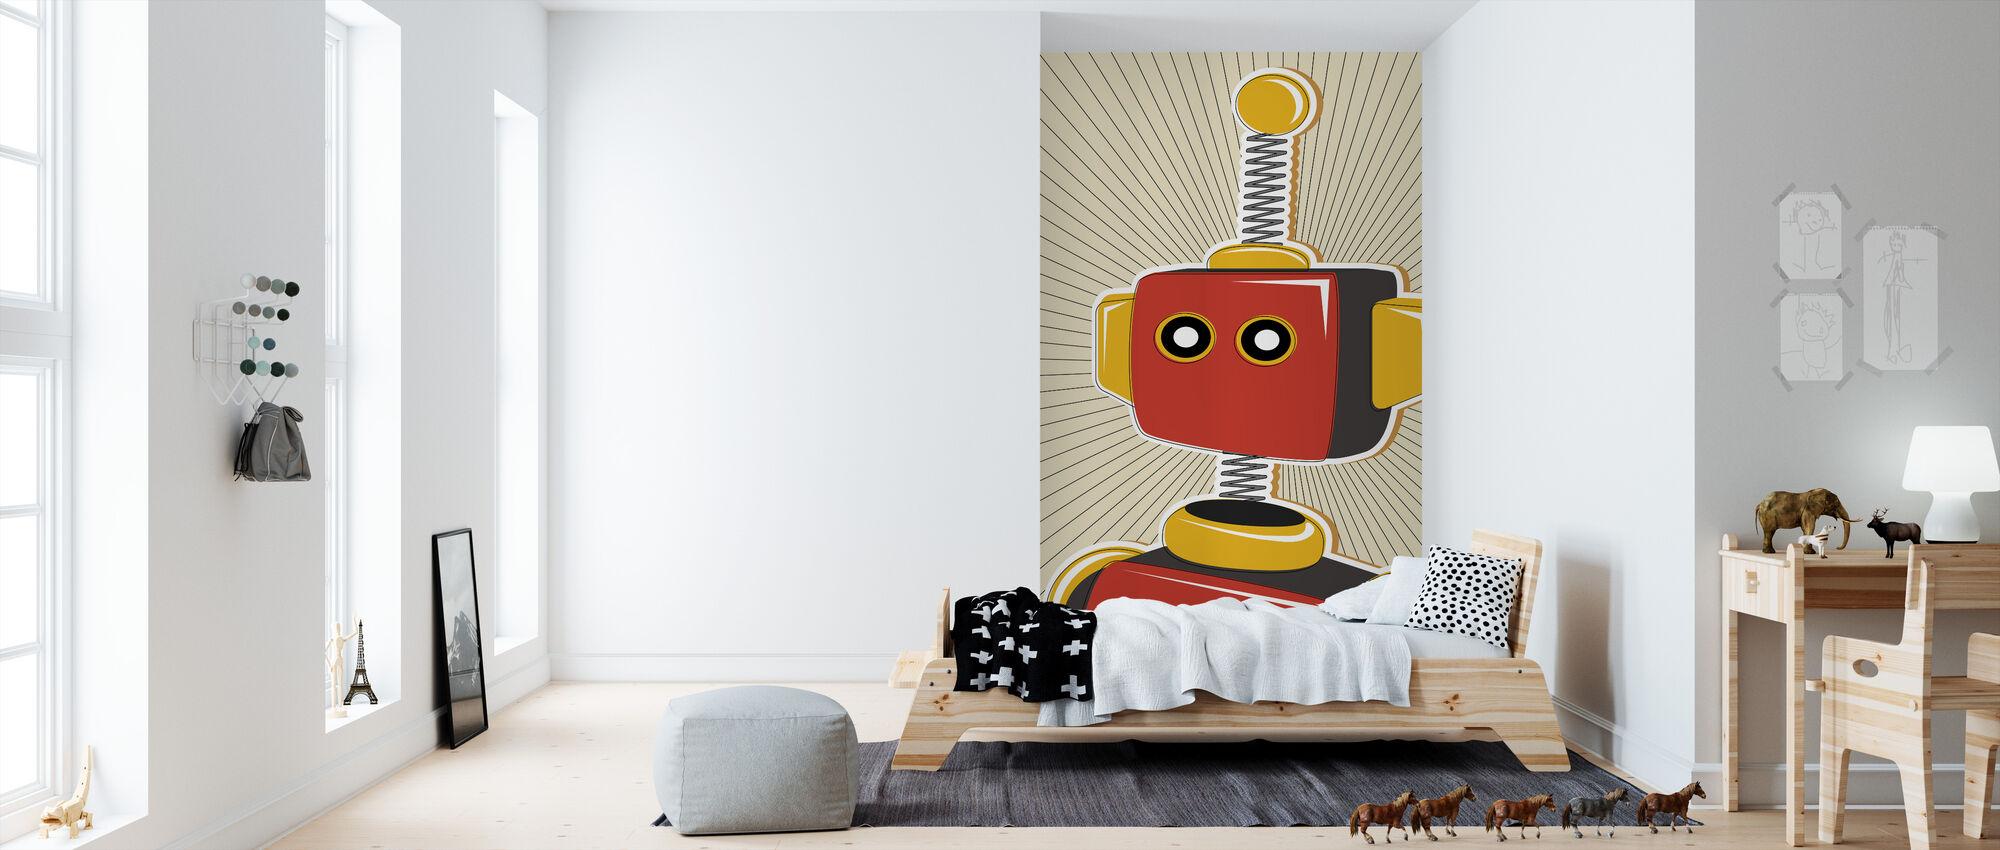 Retro Robot - Tapet - Barnerom